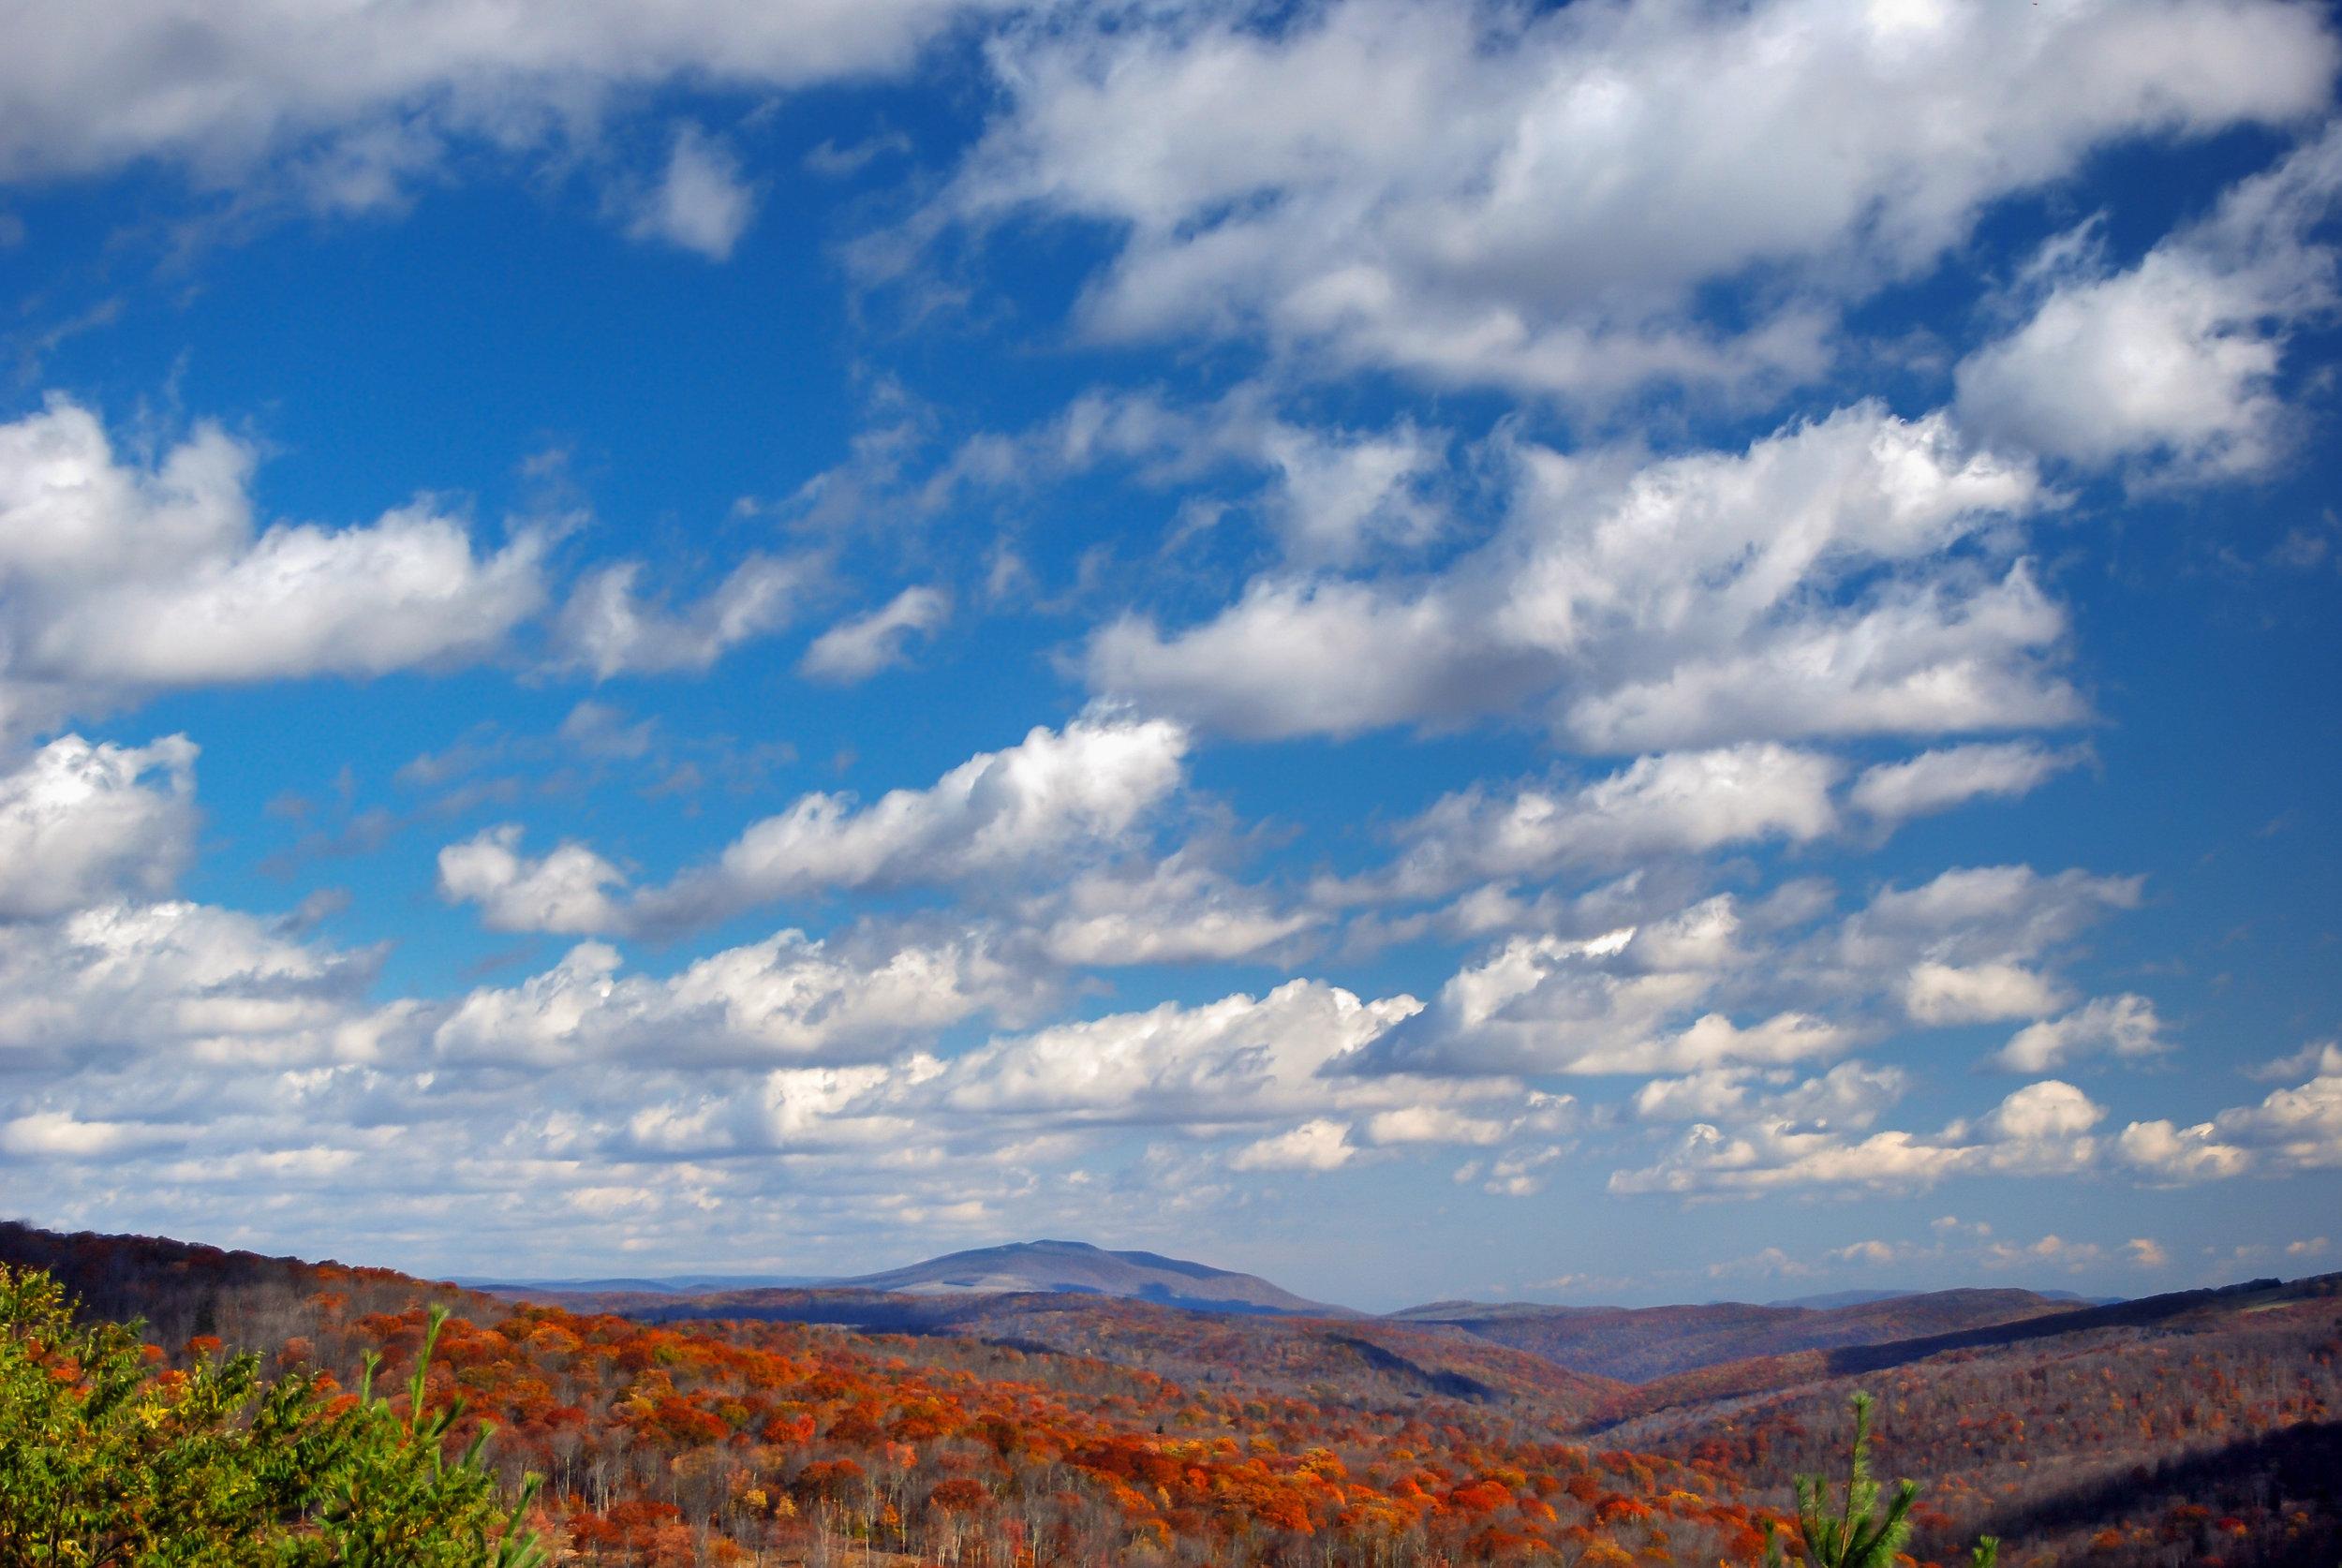 clouds-fall-autumn-highland county-virginia.jpg